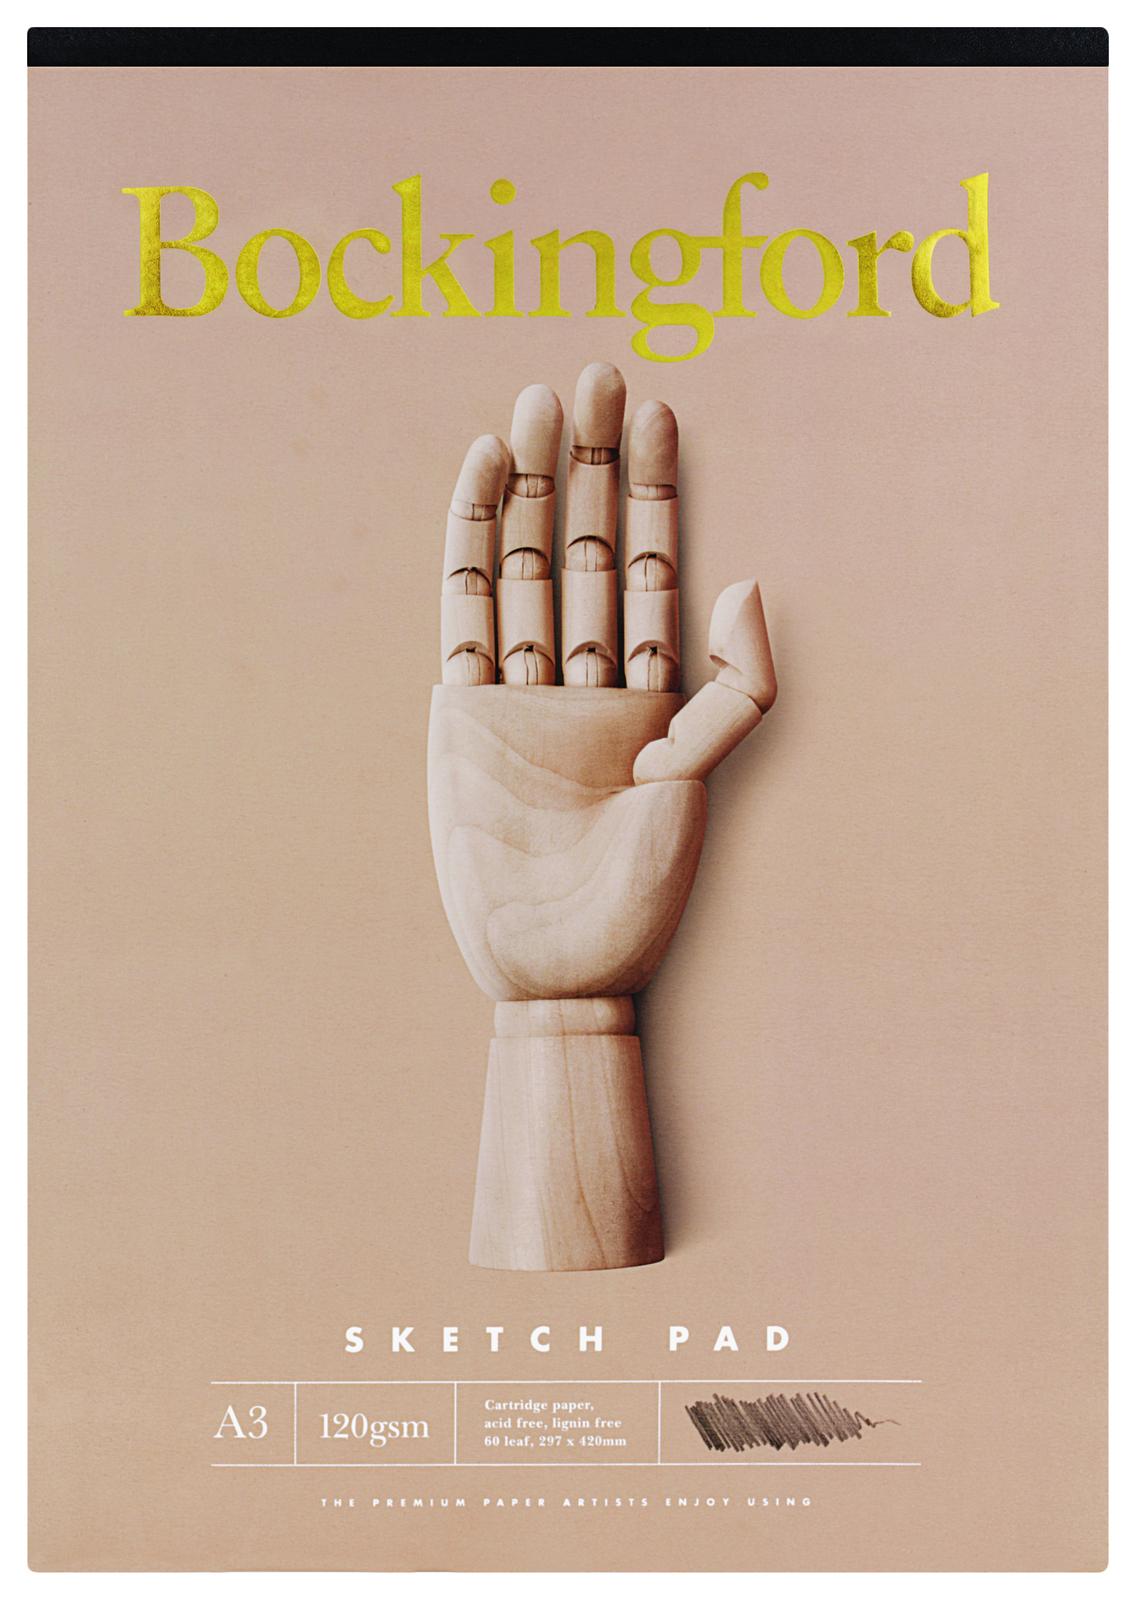 Bockingford A3 B21 60lf 120gsm Sketch Pad image